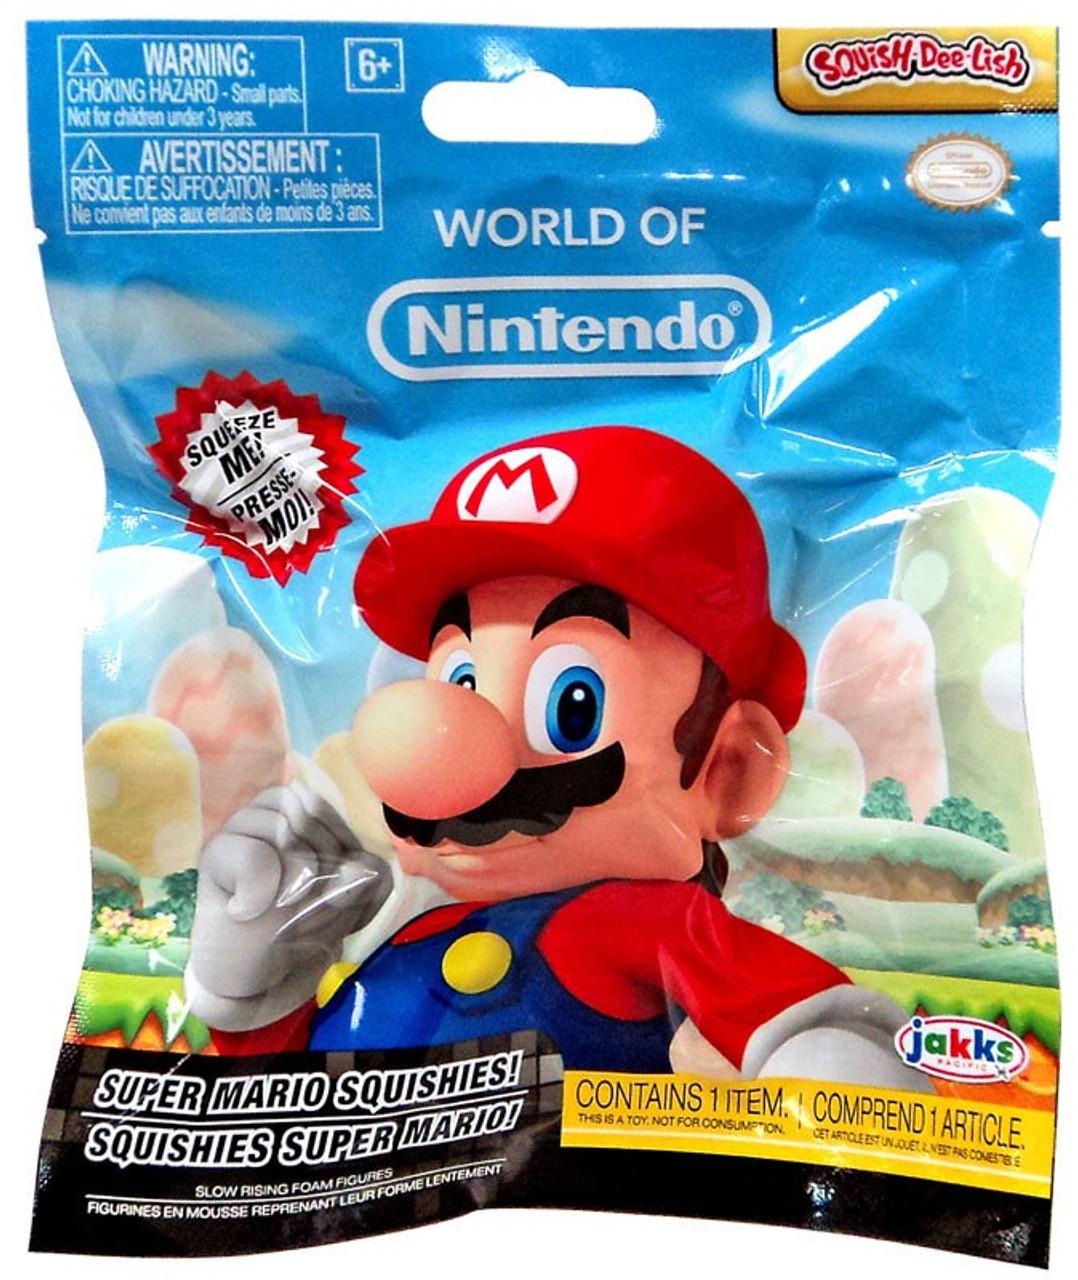 Squish Dee Lish Series 2 : World of Nintendo Squish-Dee-Lish Super Mario Series 2 Mystery Pack Jakks Pacific - ToyWiz